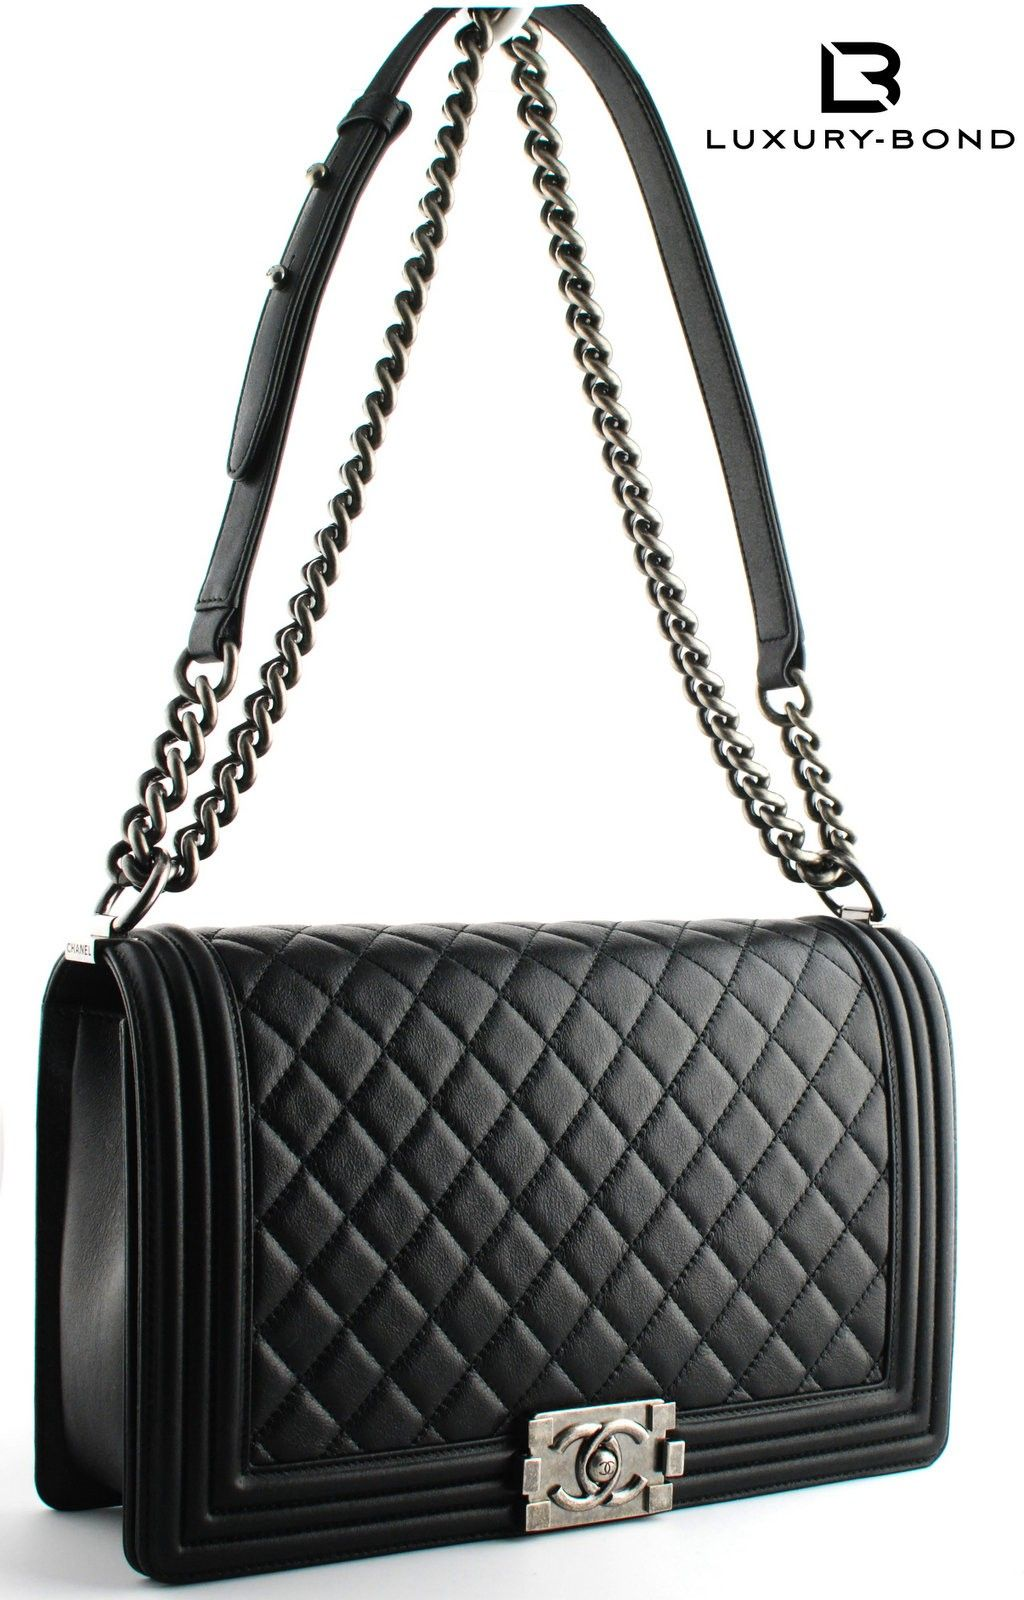 e29883e0856e Chanel Black Boy Bag Chanel Le Boy New Medium Size Black Metallic Calf Flap  Bag